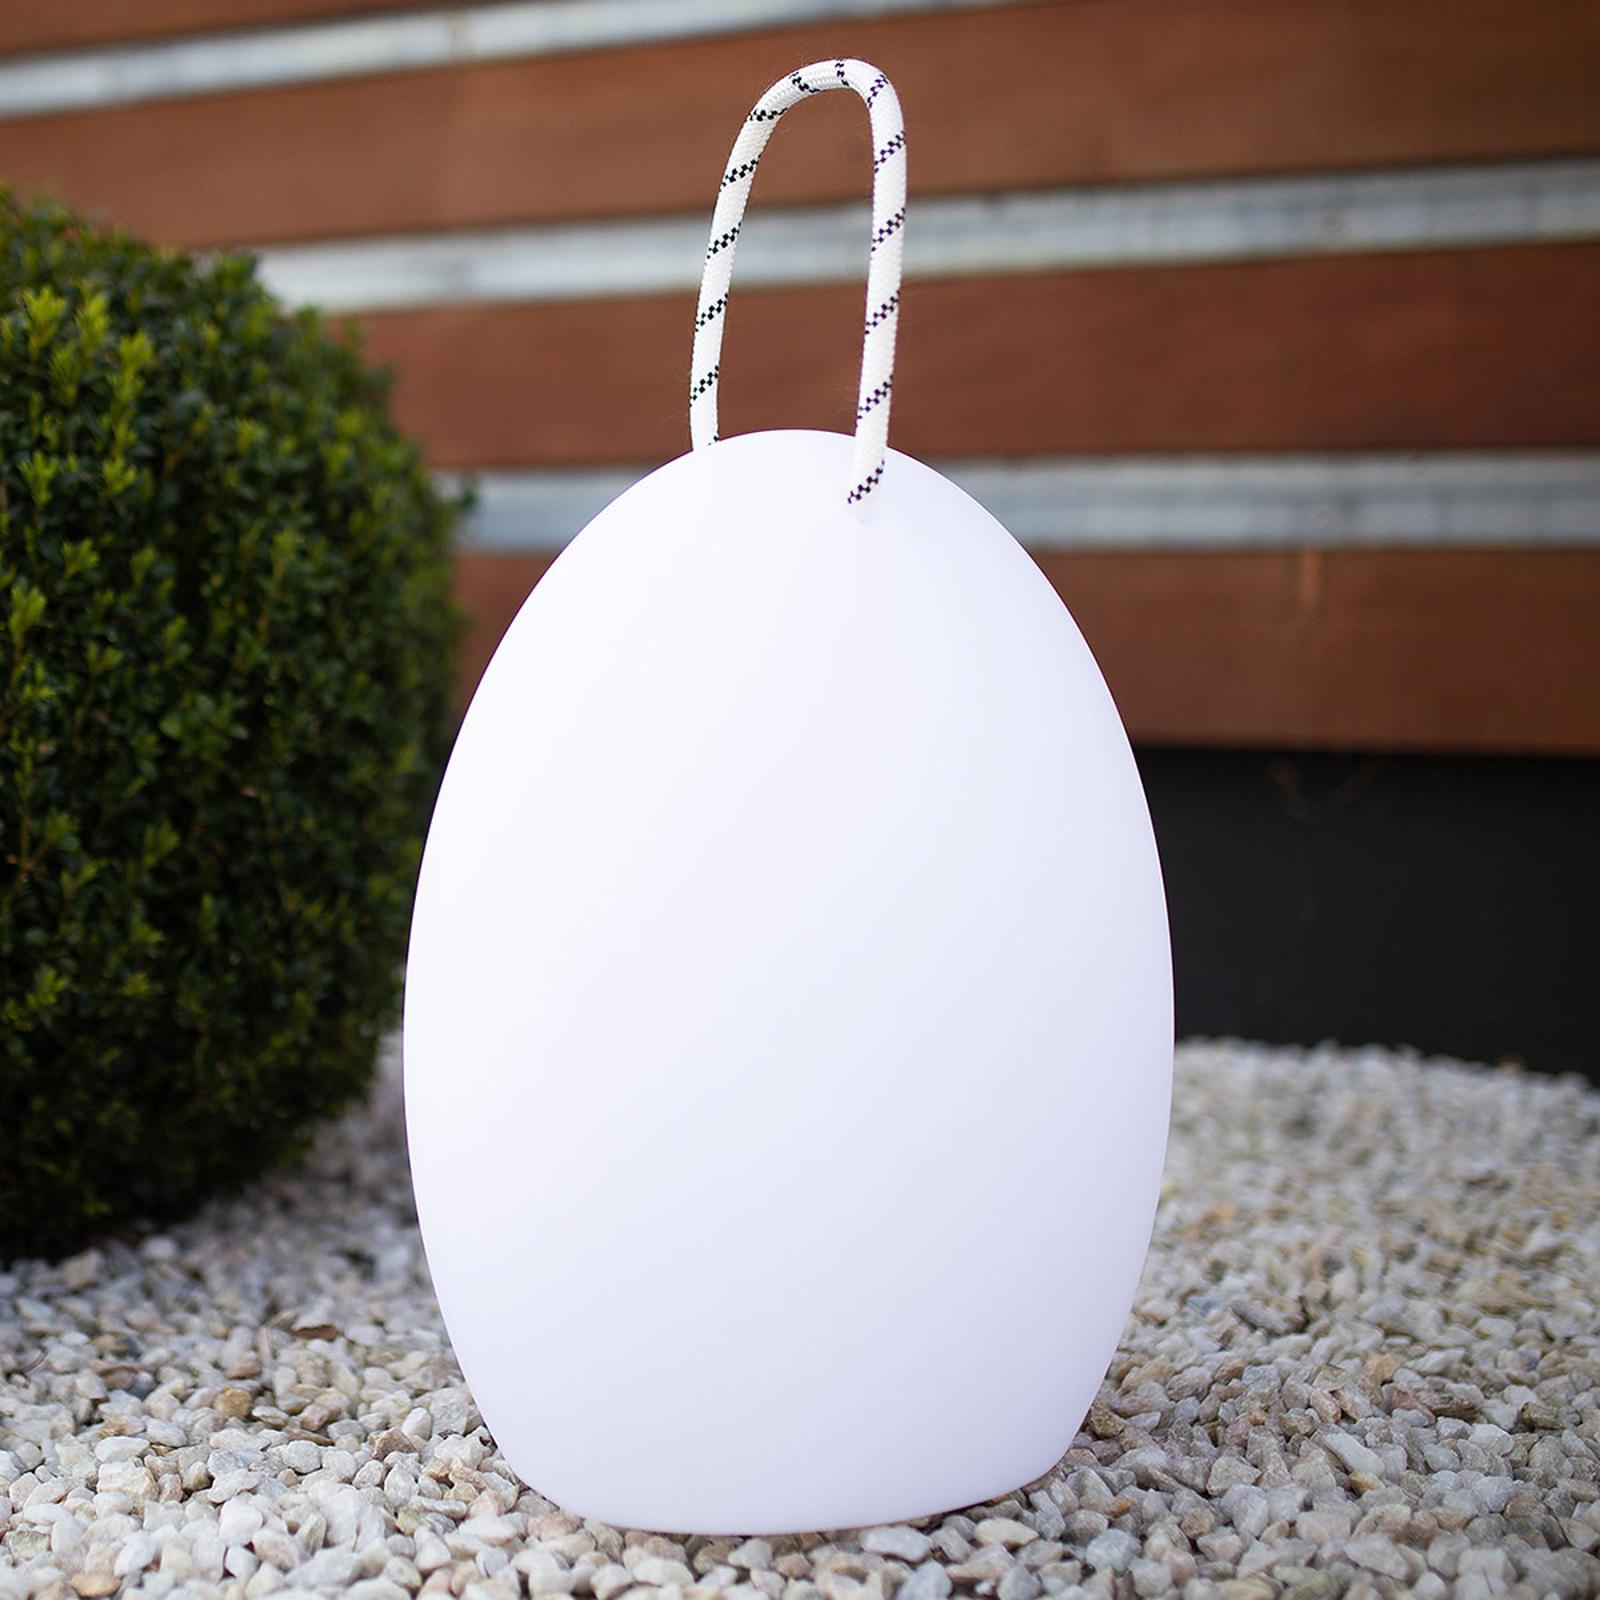 Amande Cord 395 -LED-koristevalaisin, 39,5 cm